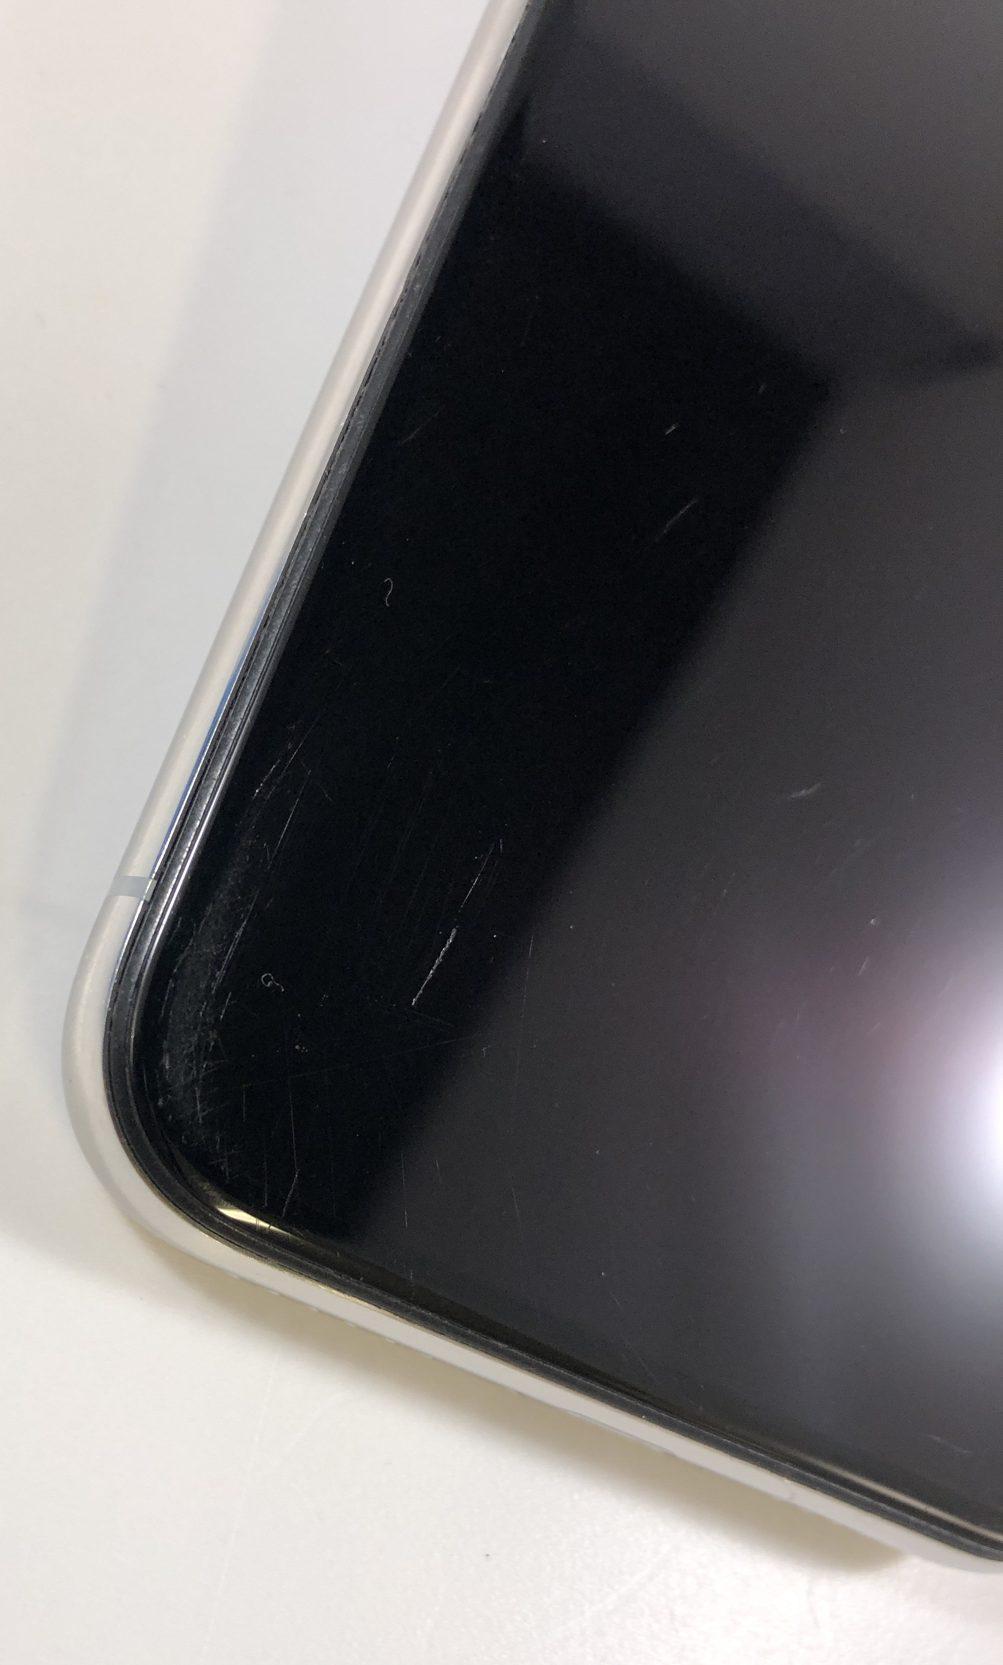 iPhone X 256GB, 256GB, Silver, bild 2